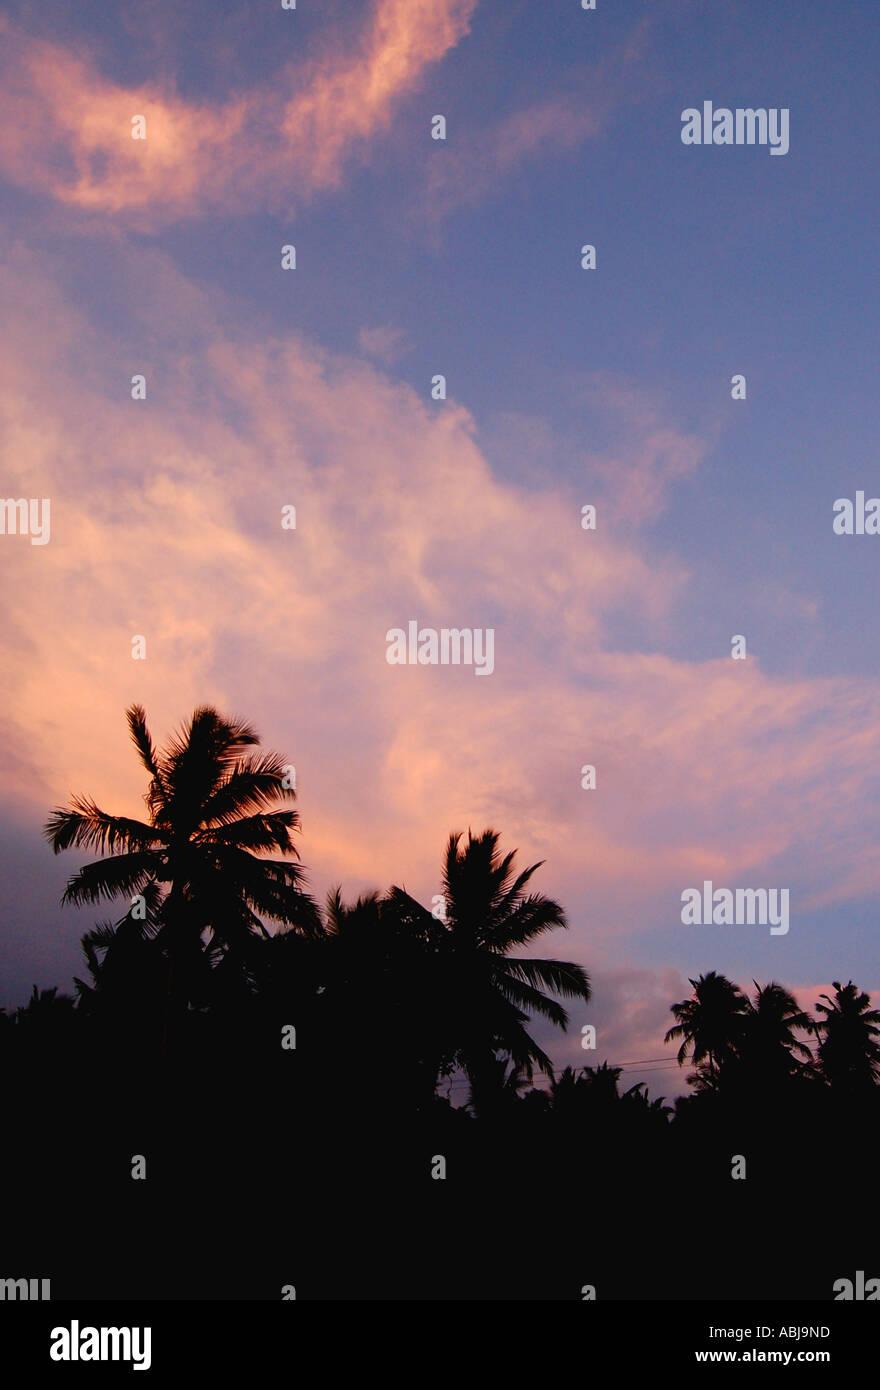 Palmtrees at sunset - Sri Lanka Stock Photo